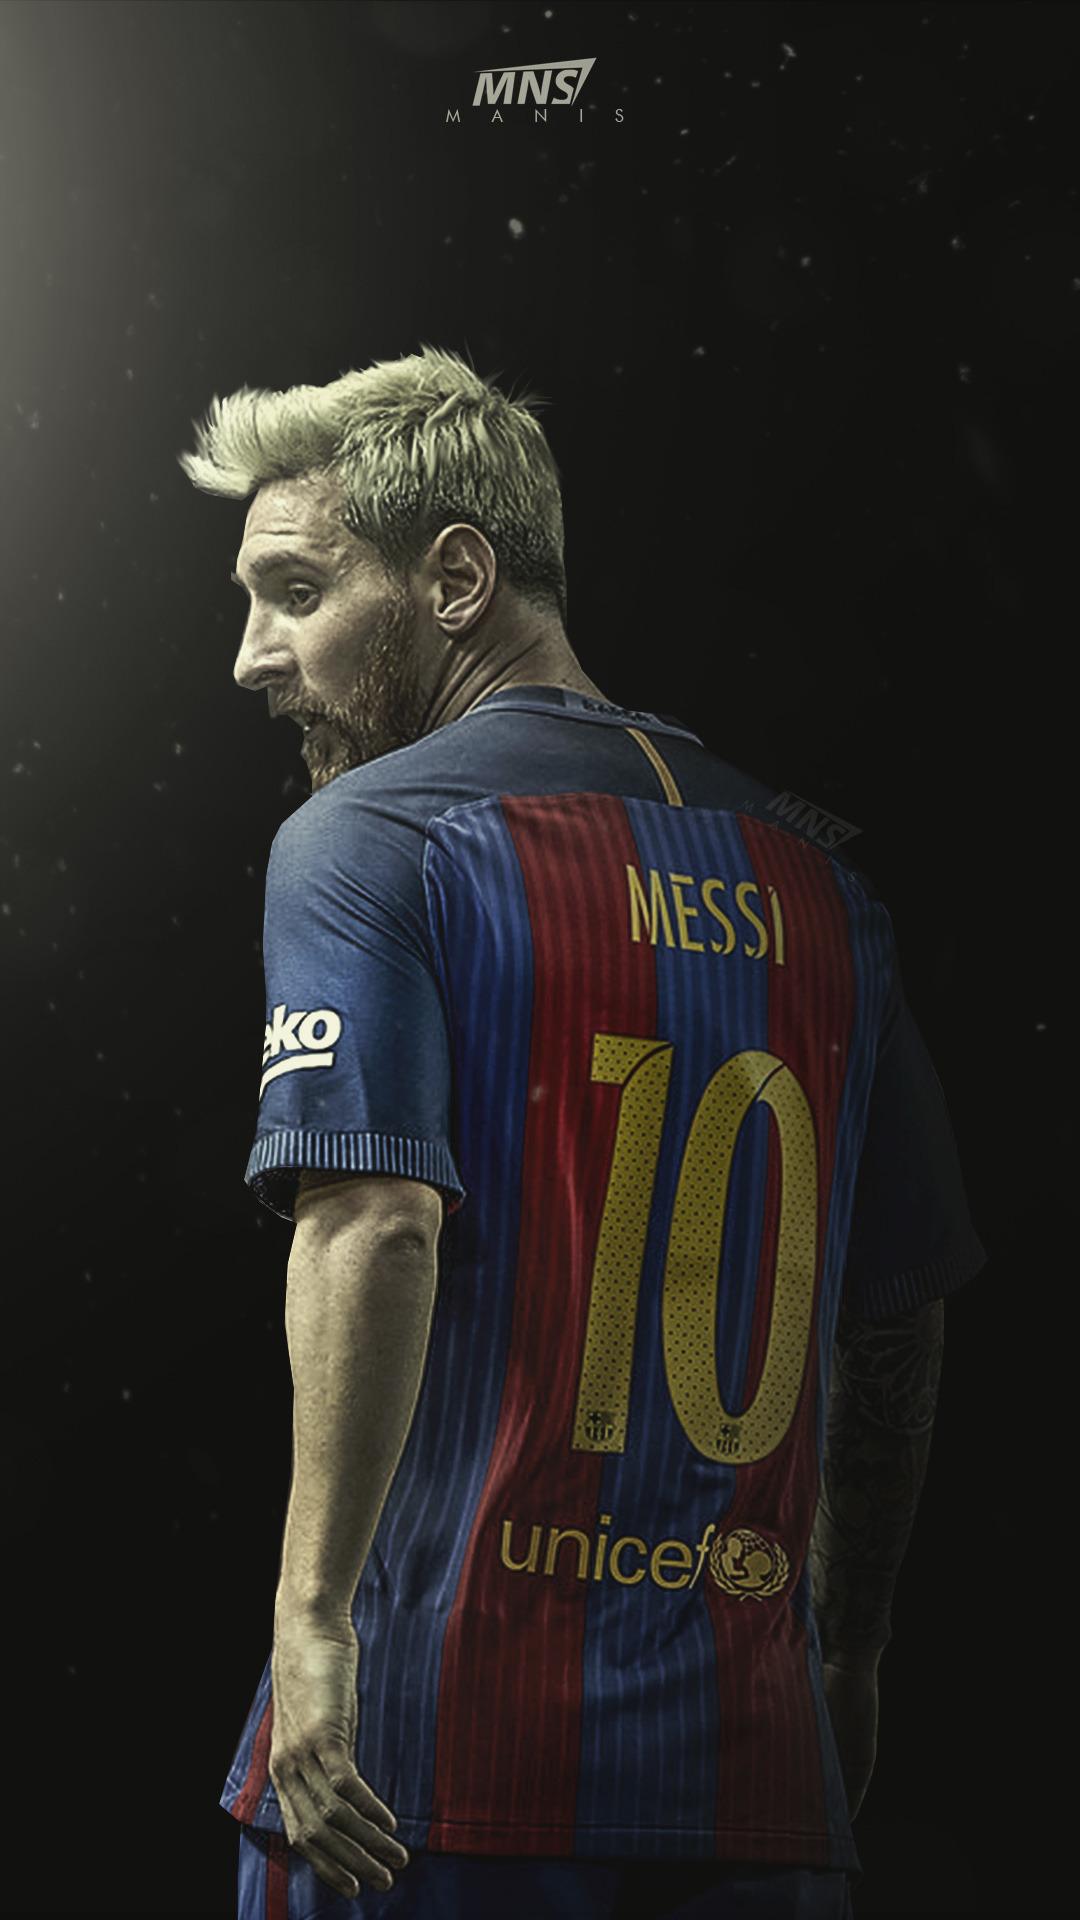 Fondos de pantalla fc barcelona fondos de pantalla for Fotos de futbol para fondo de pantalla